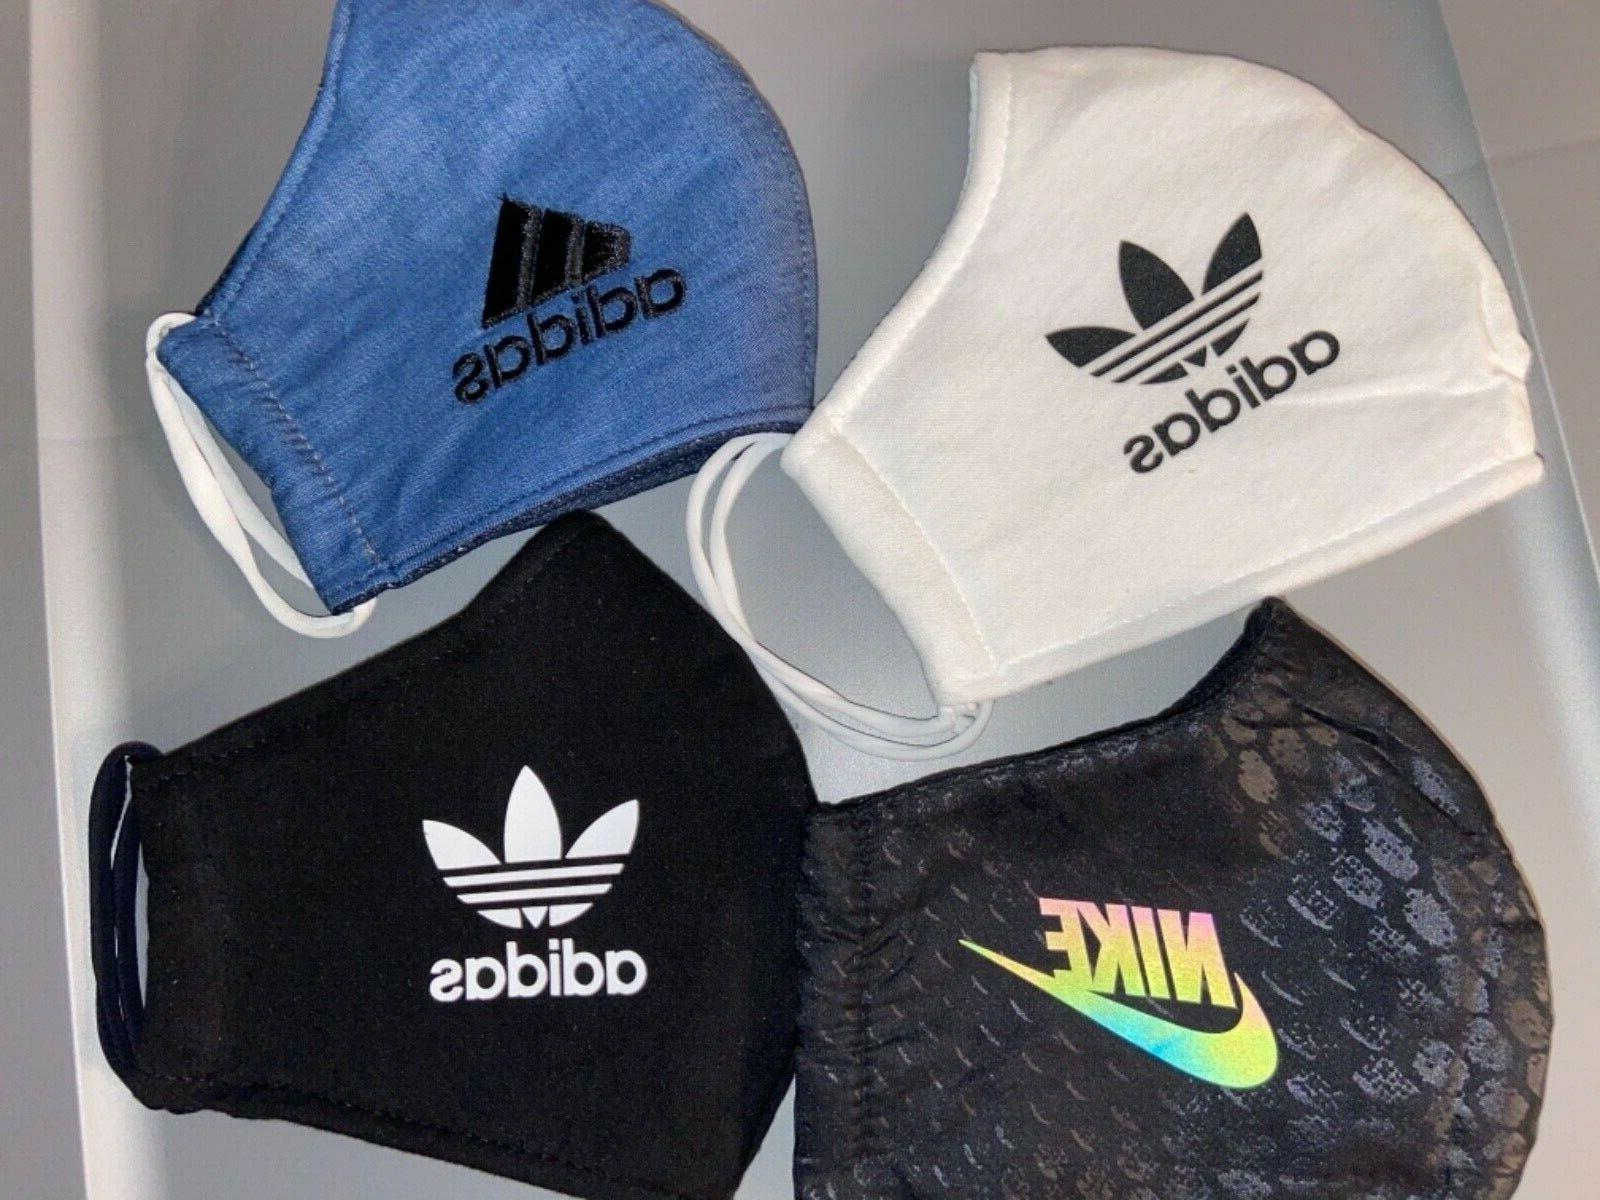 New Adidas Nike Mask 100% Cotton